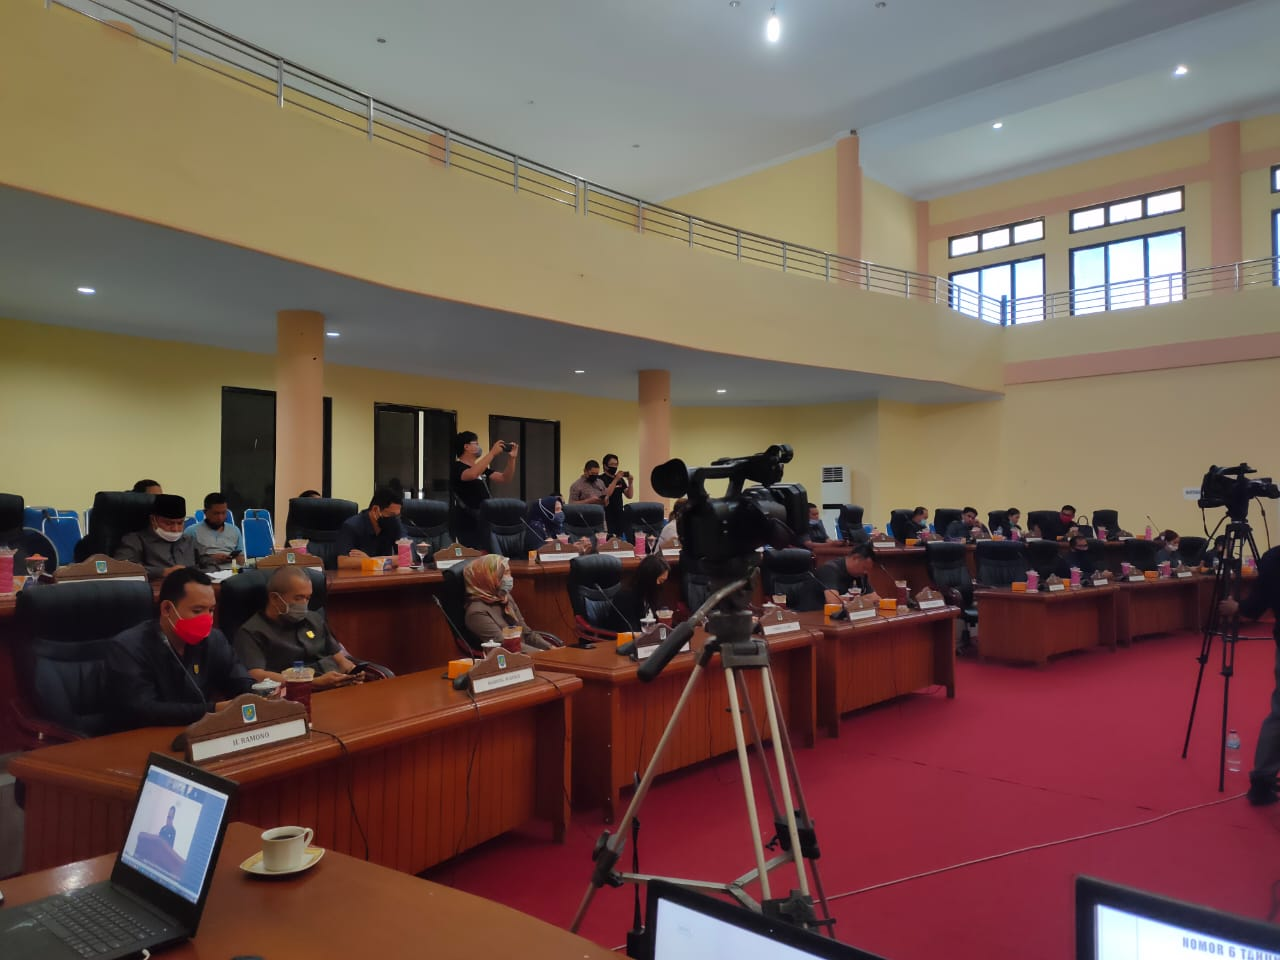 DPRD Bolmong Gelar Paripurna Penetapan Perda RPJMD Tahun 2017-2022 Advertorial Bolmong Headline Terkini